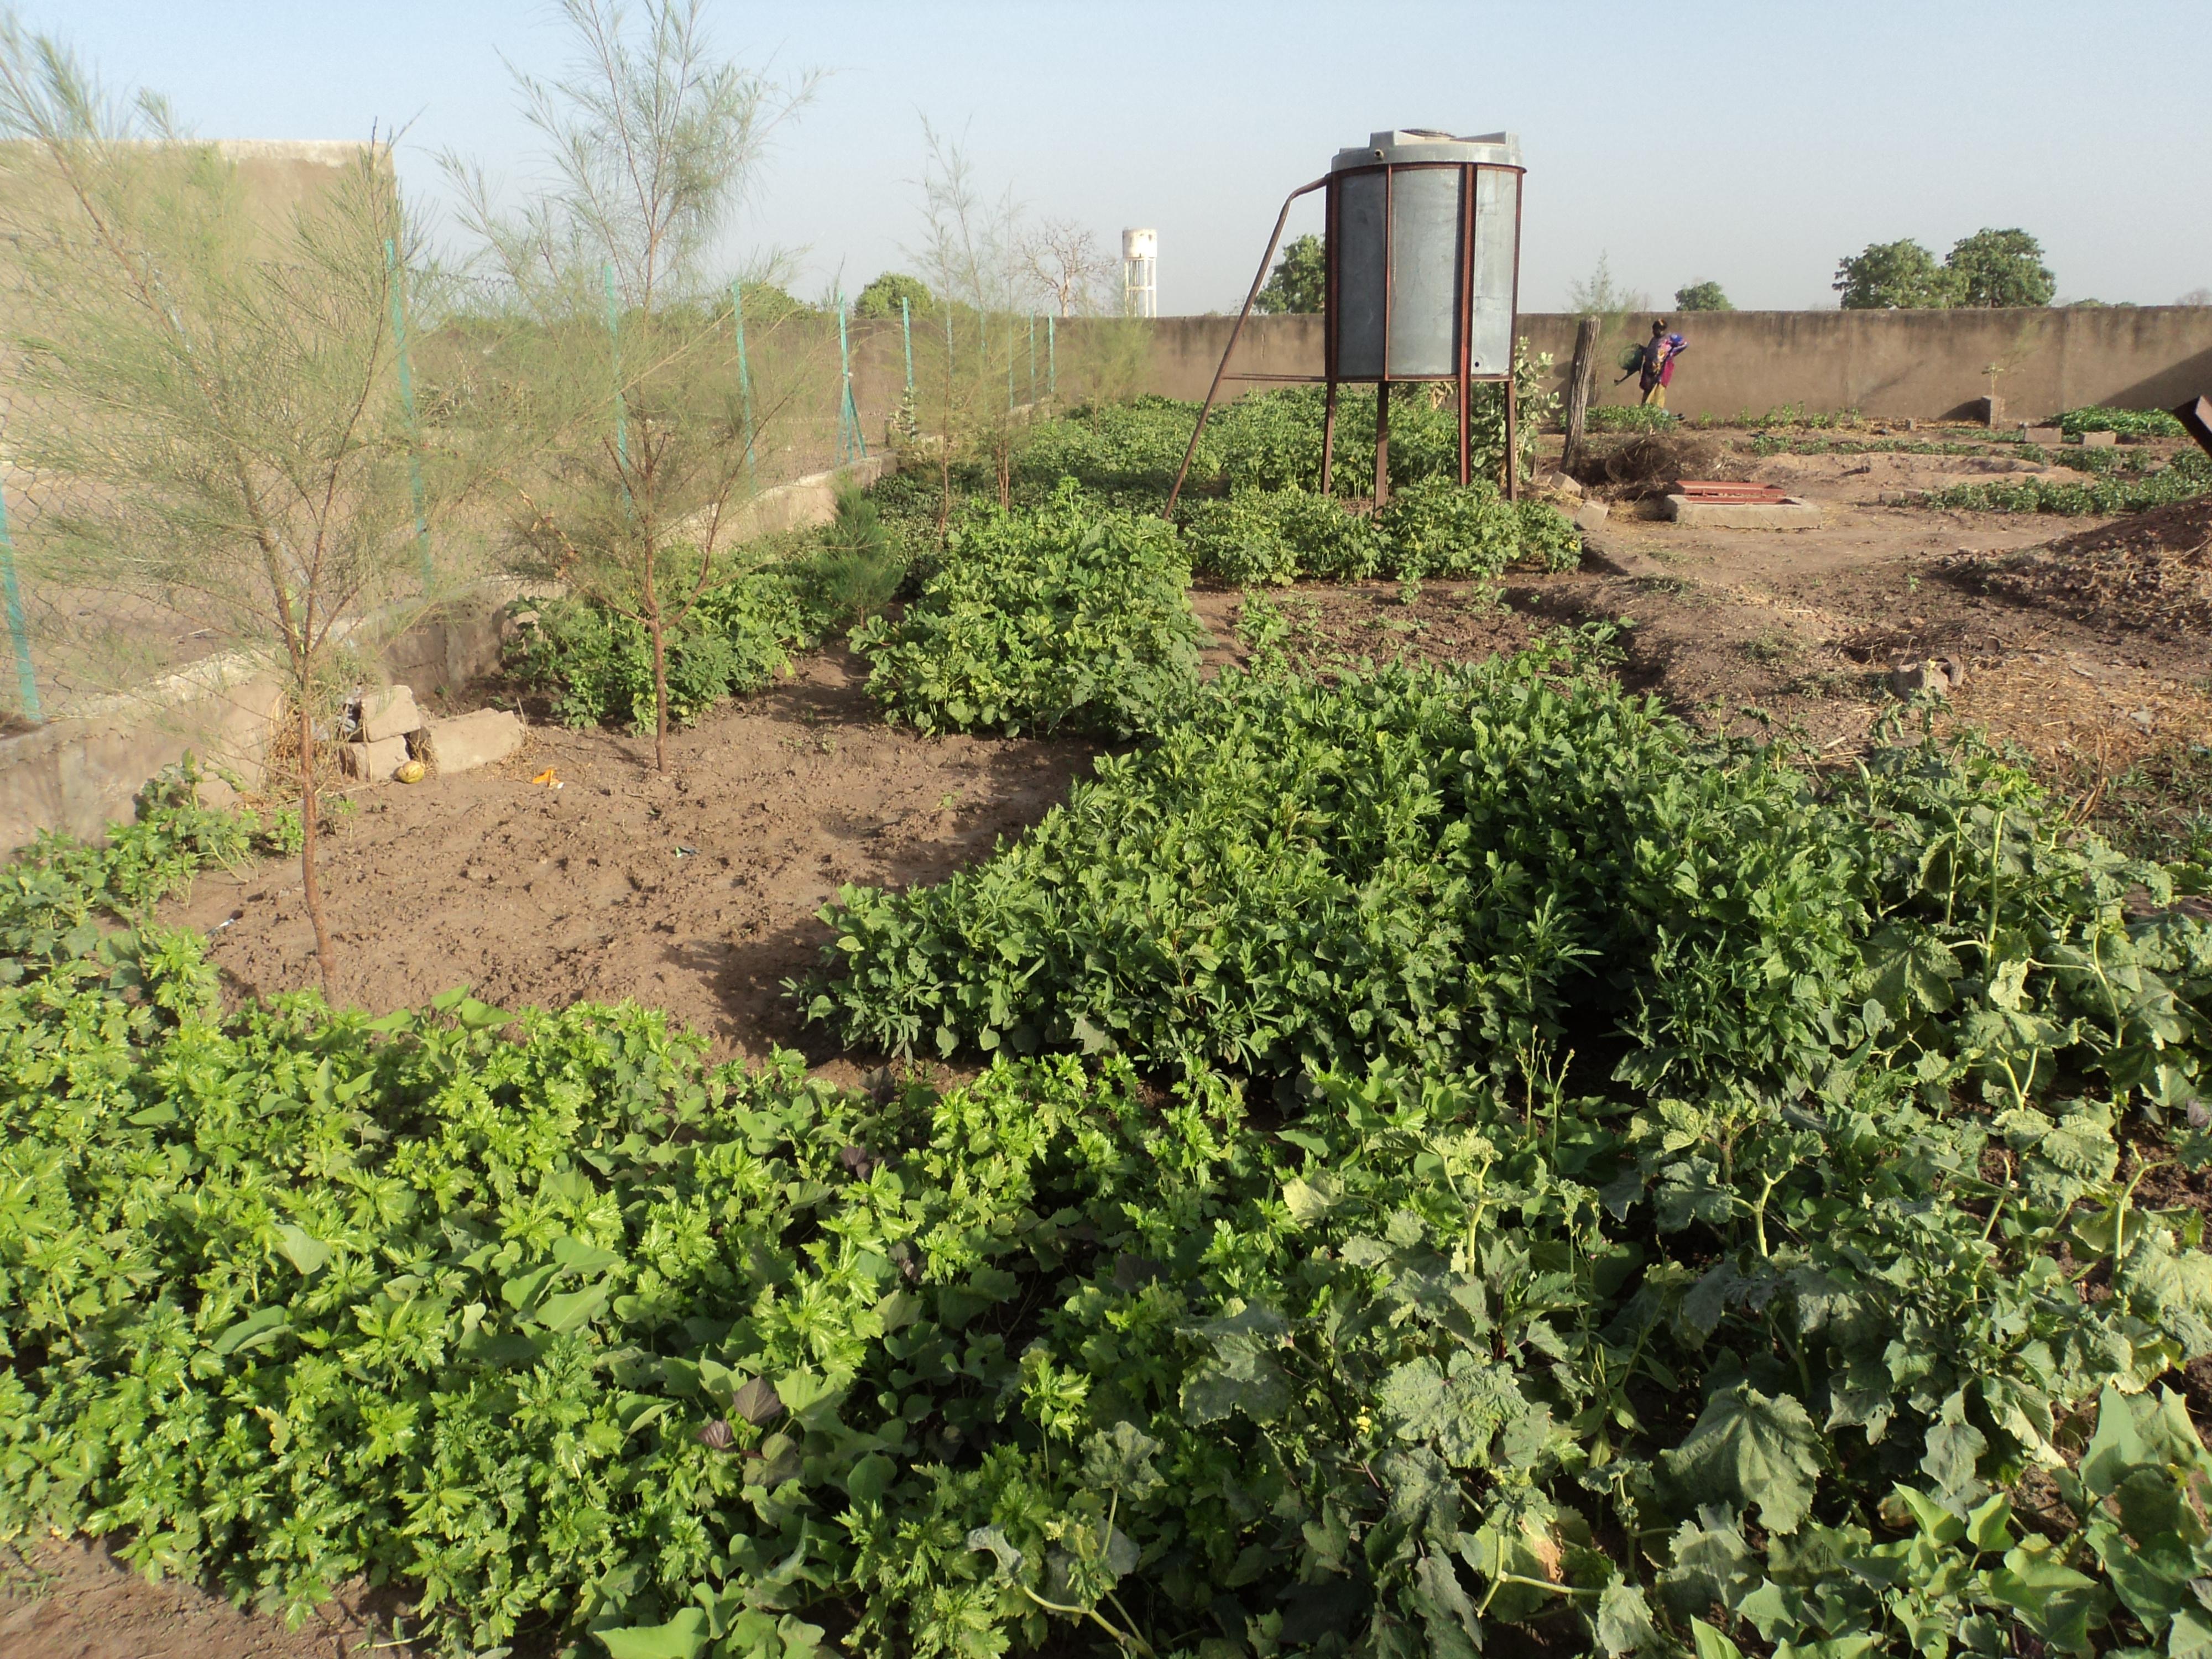 Soutenez le jardin maraicher scolaire de Medina-Mary